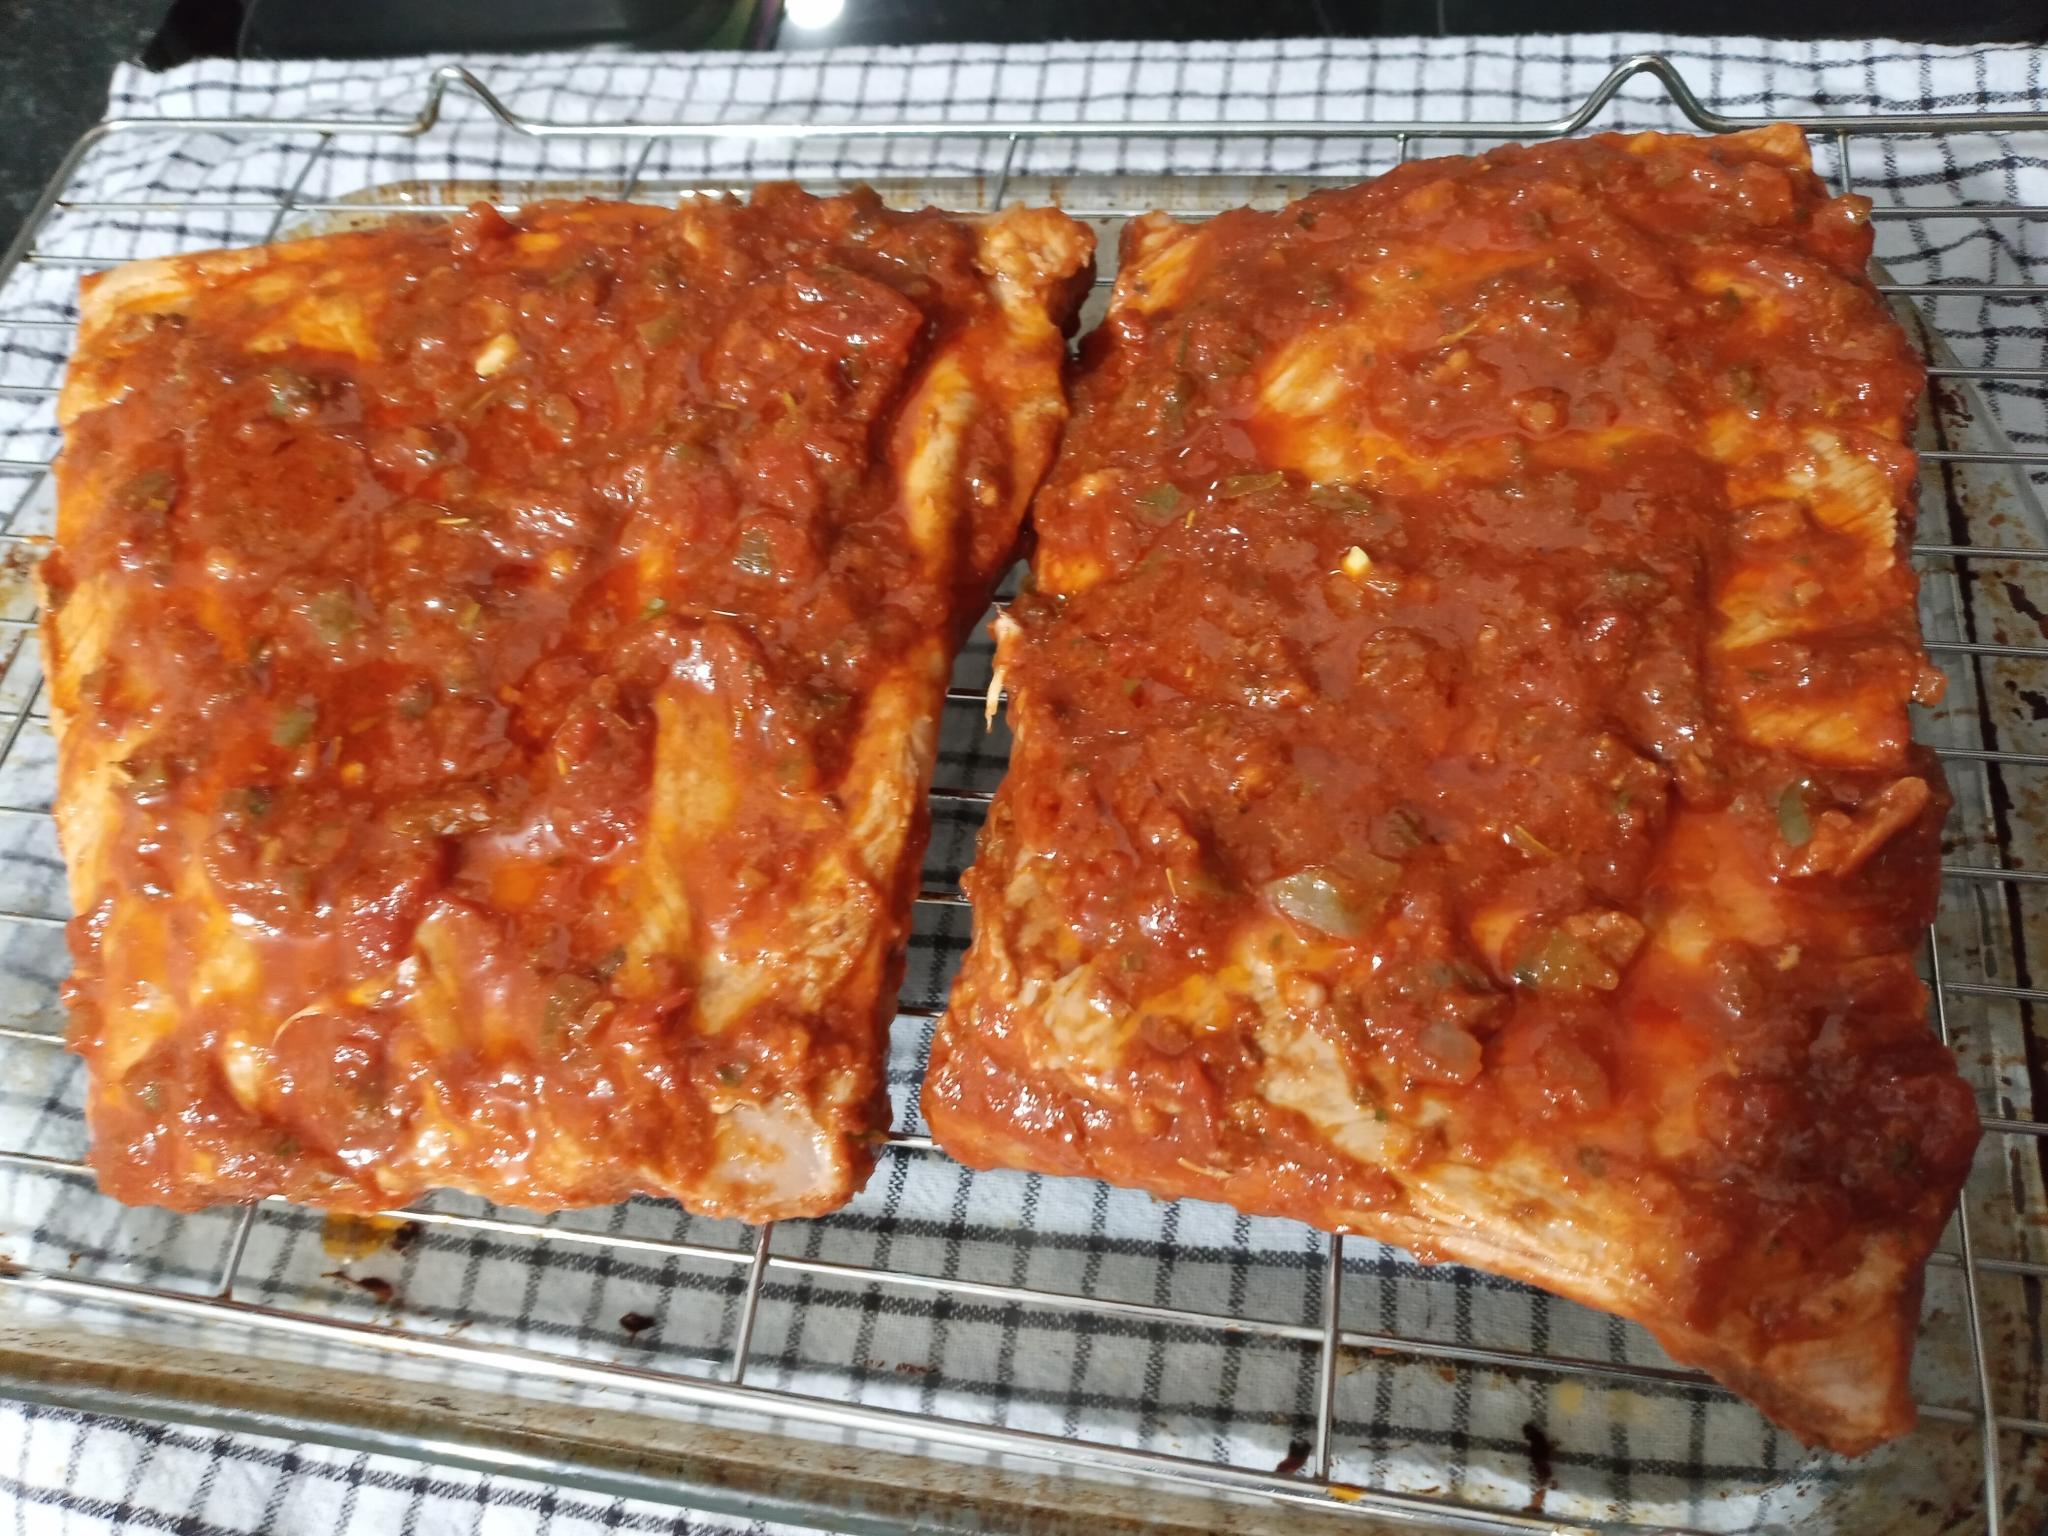 The Blokes' Cookery Thread-20210428_170710_mfnr-jpg